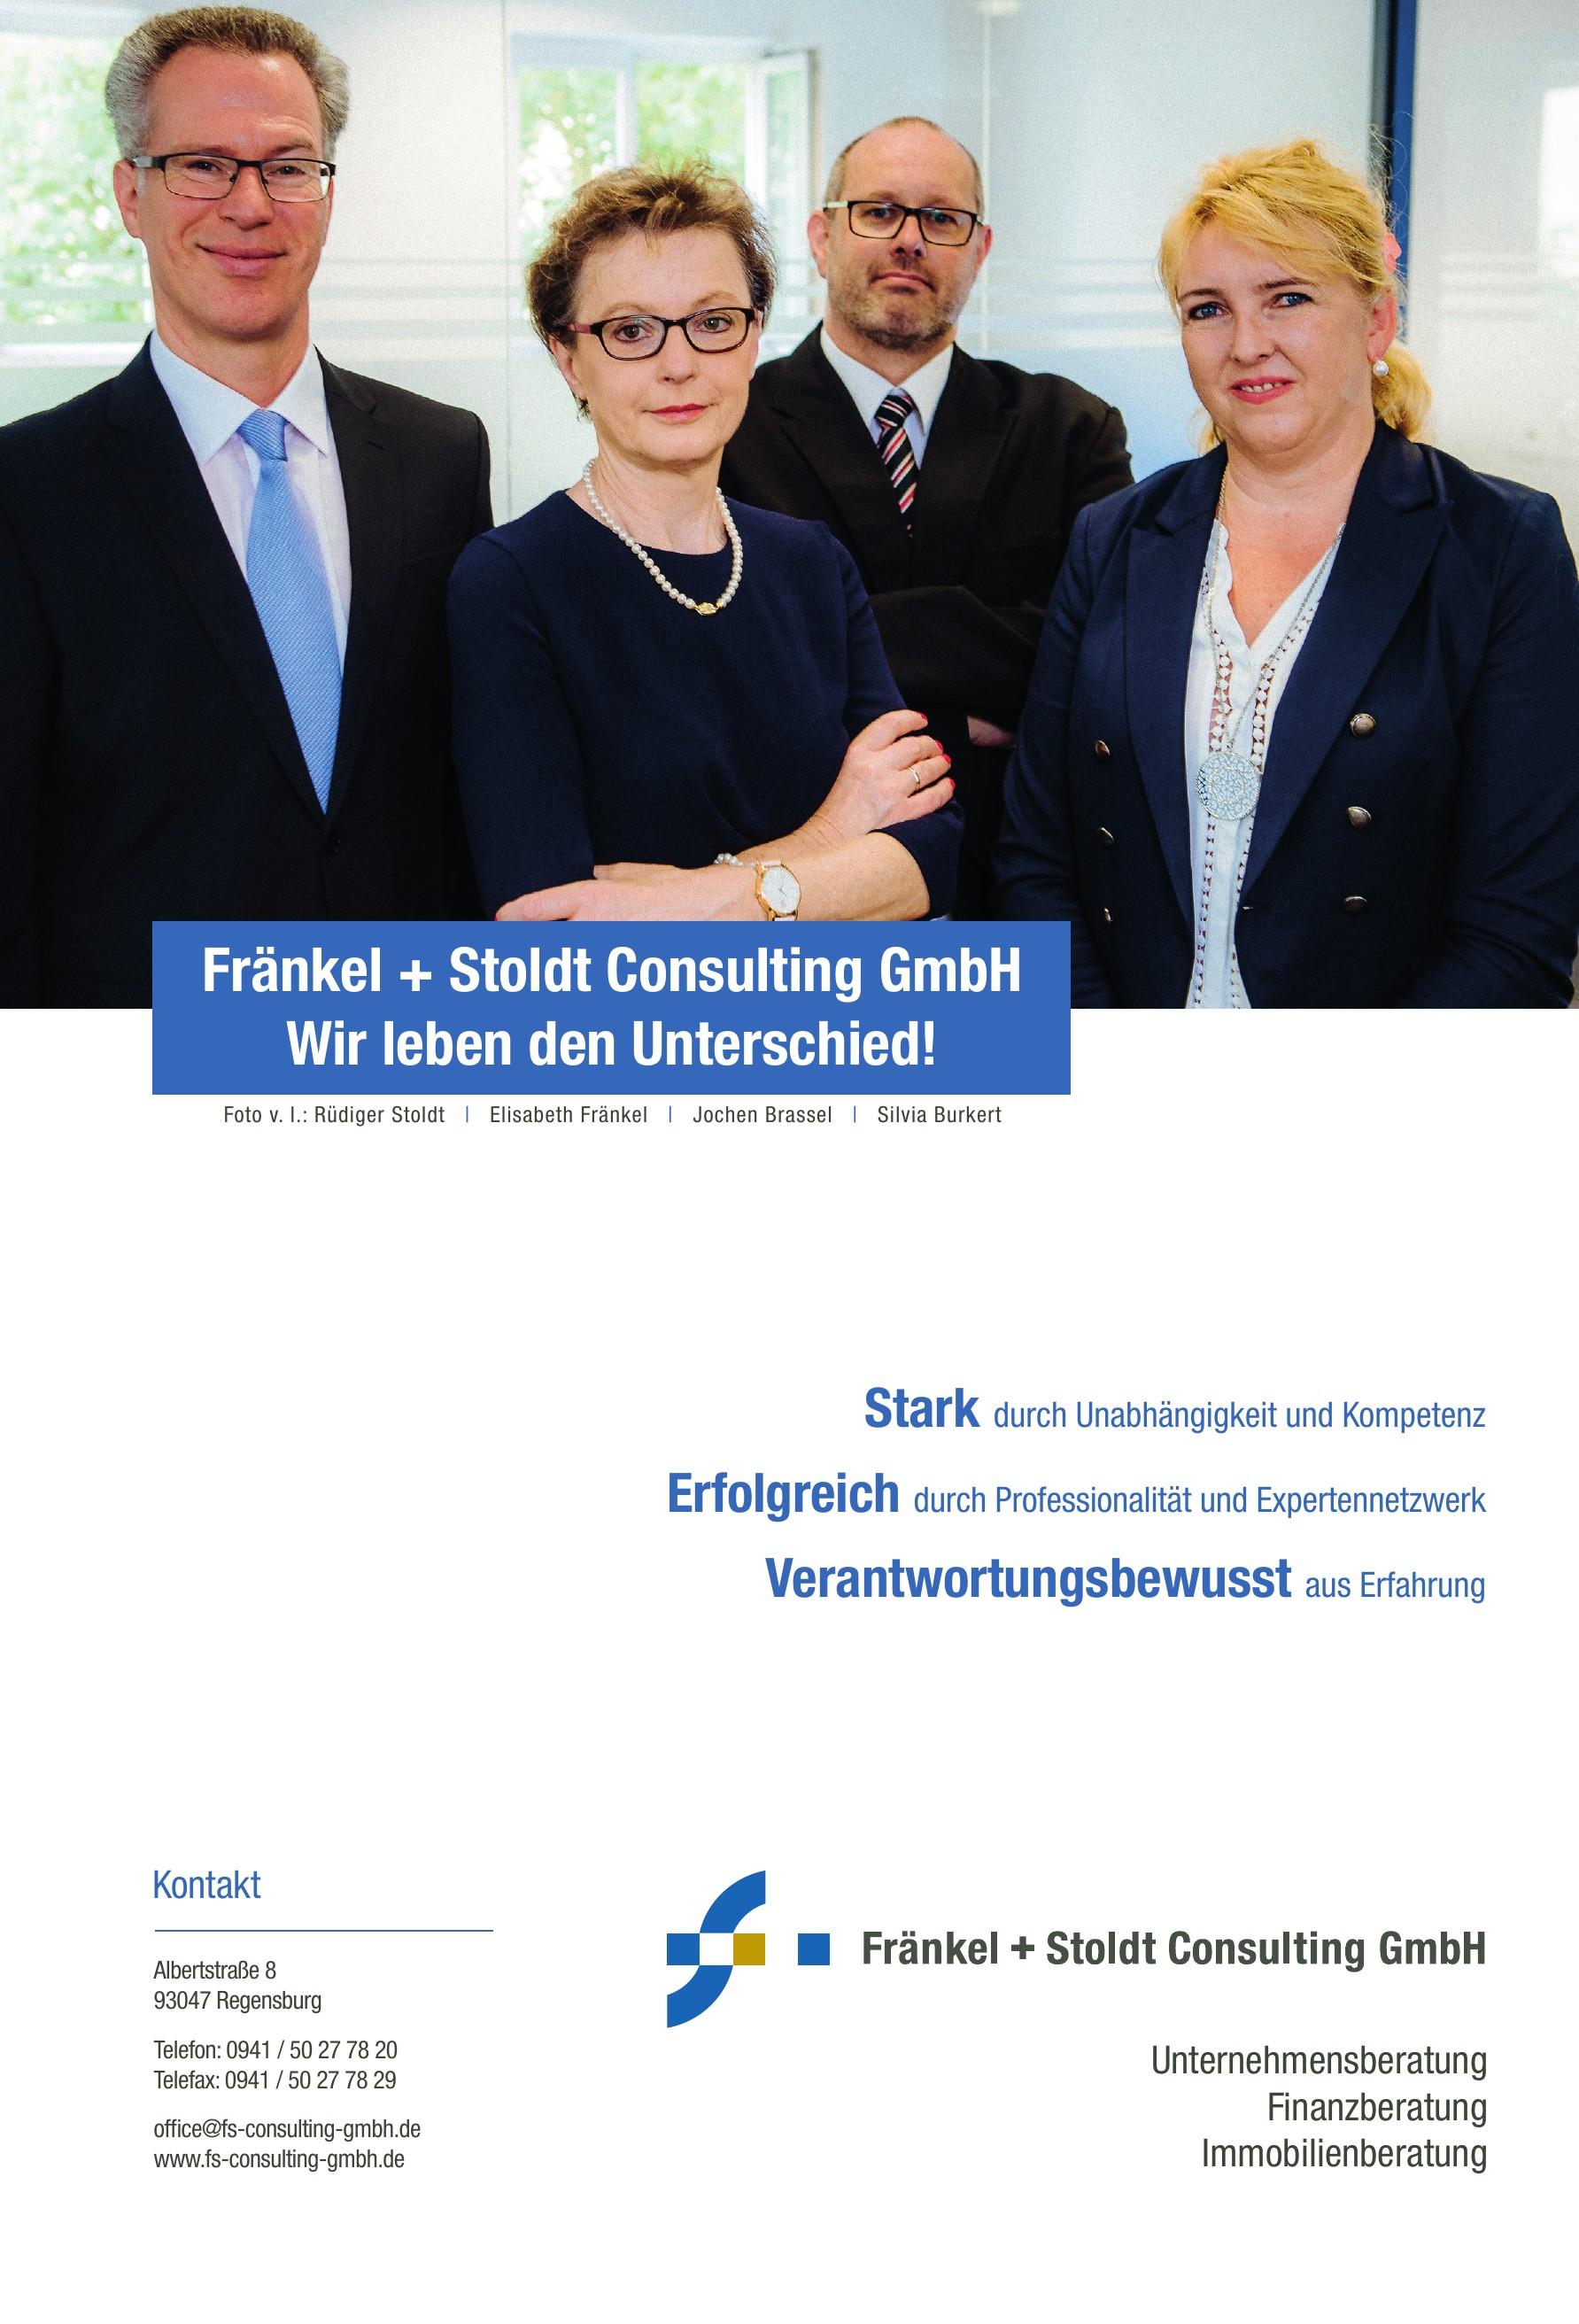 Fränkel + Stoldt Consulting GmbH